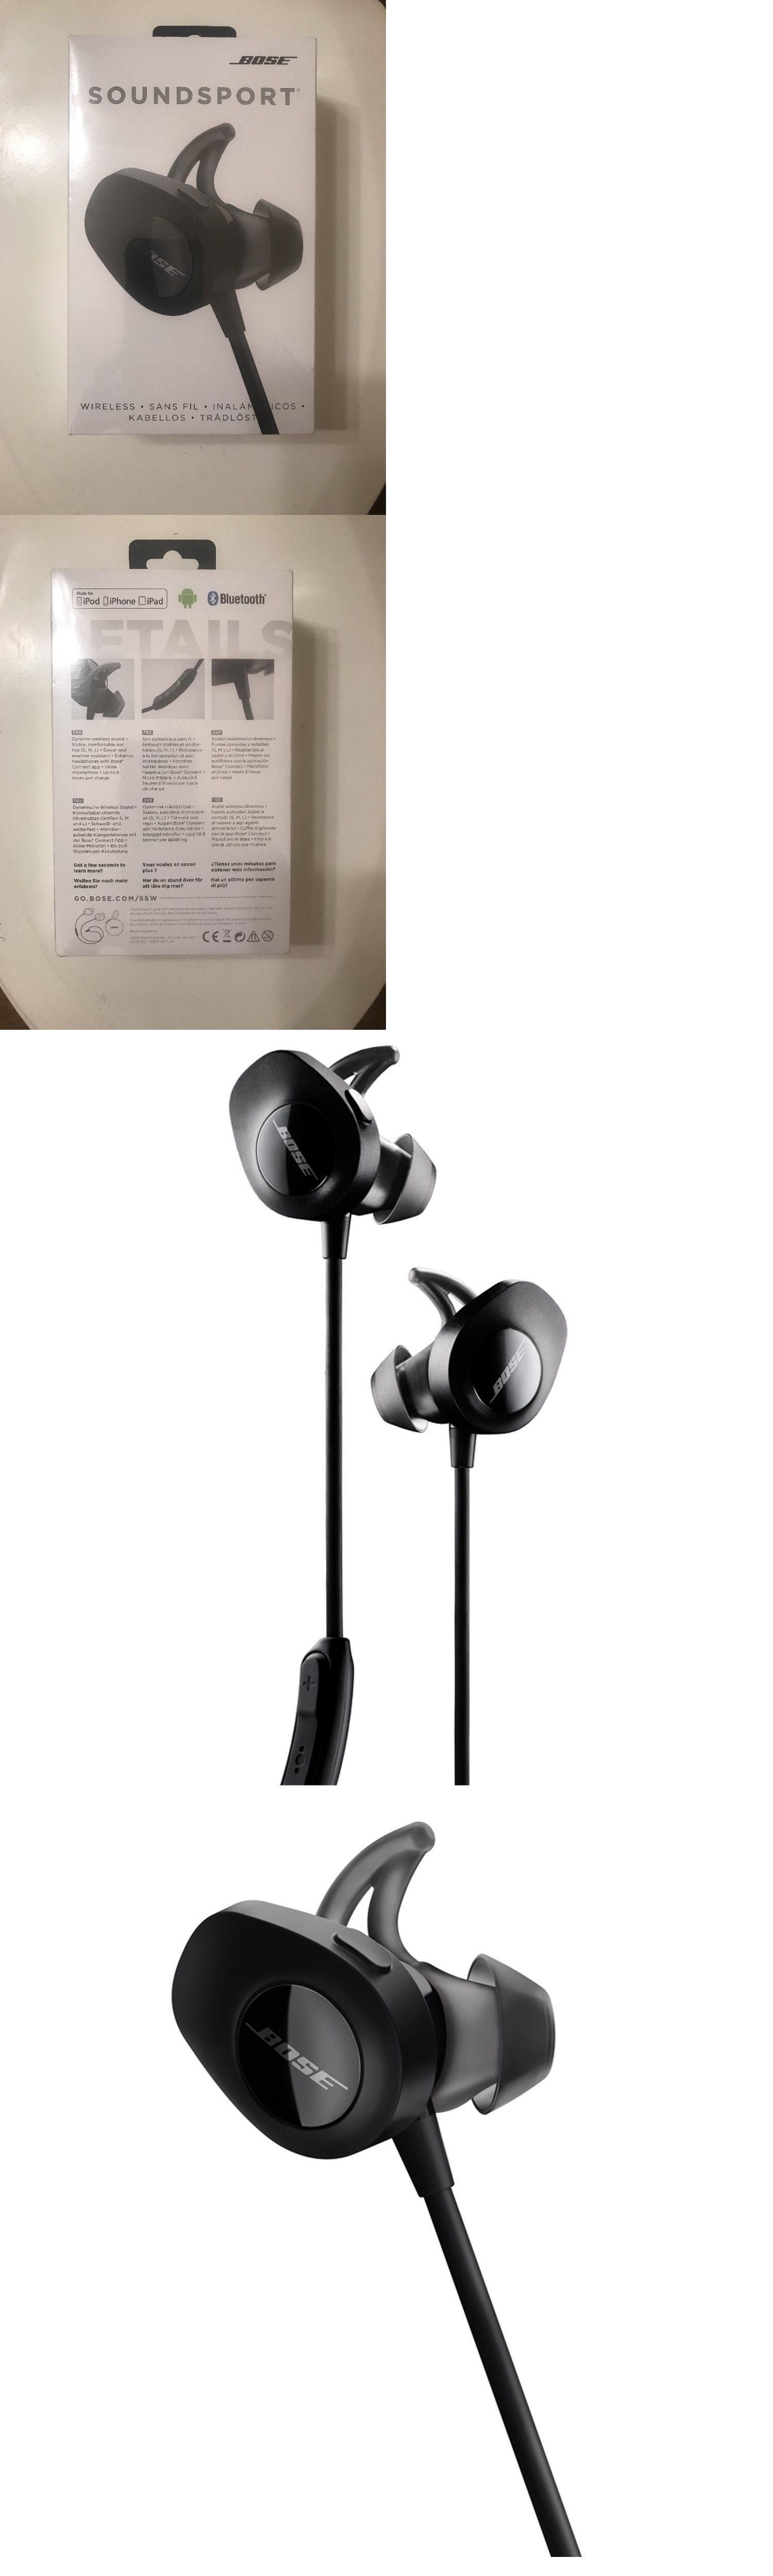 bose headphones sport box. headsets and earpieces: brand new in box bose sound sport wireless headphones, black free headphones